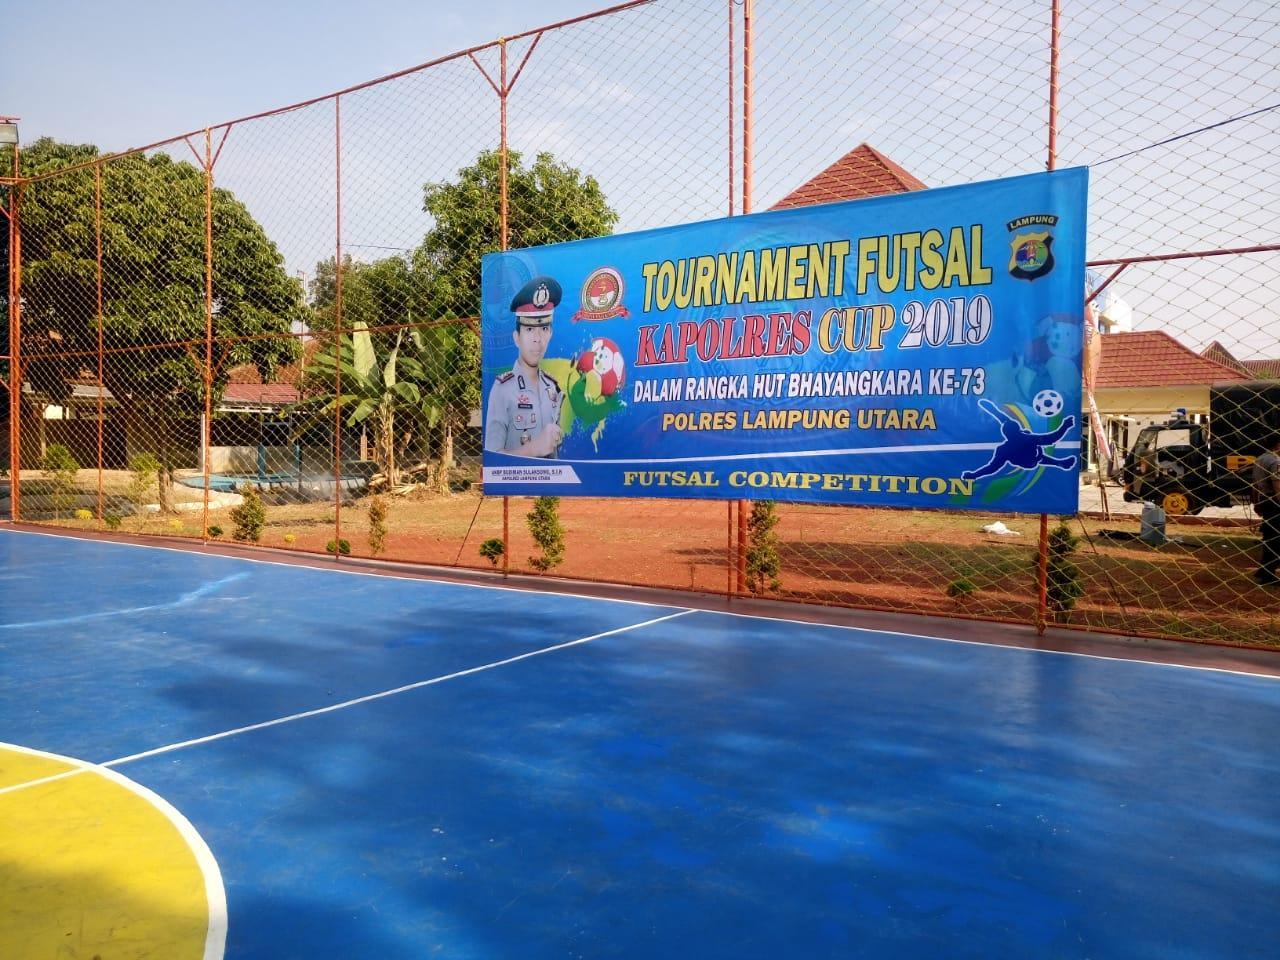 Tim Siap Berlaga di Turnamen Futsal Kapolres Cup Lampung Utara